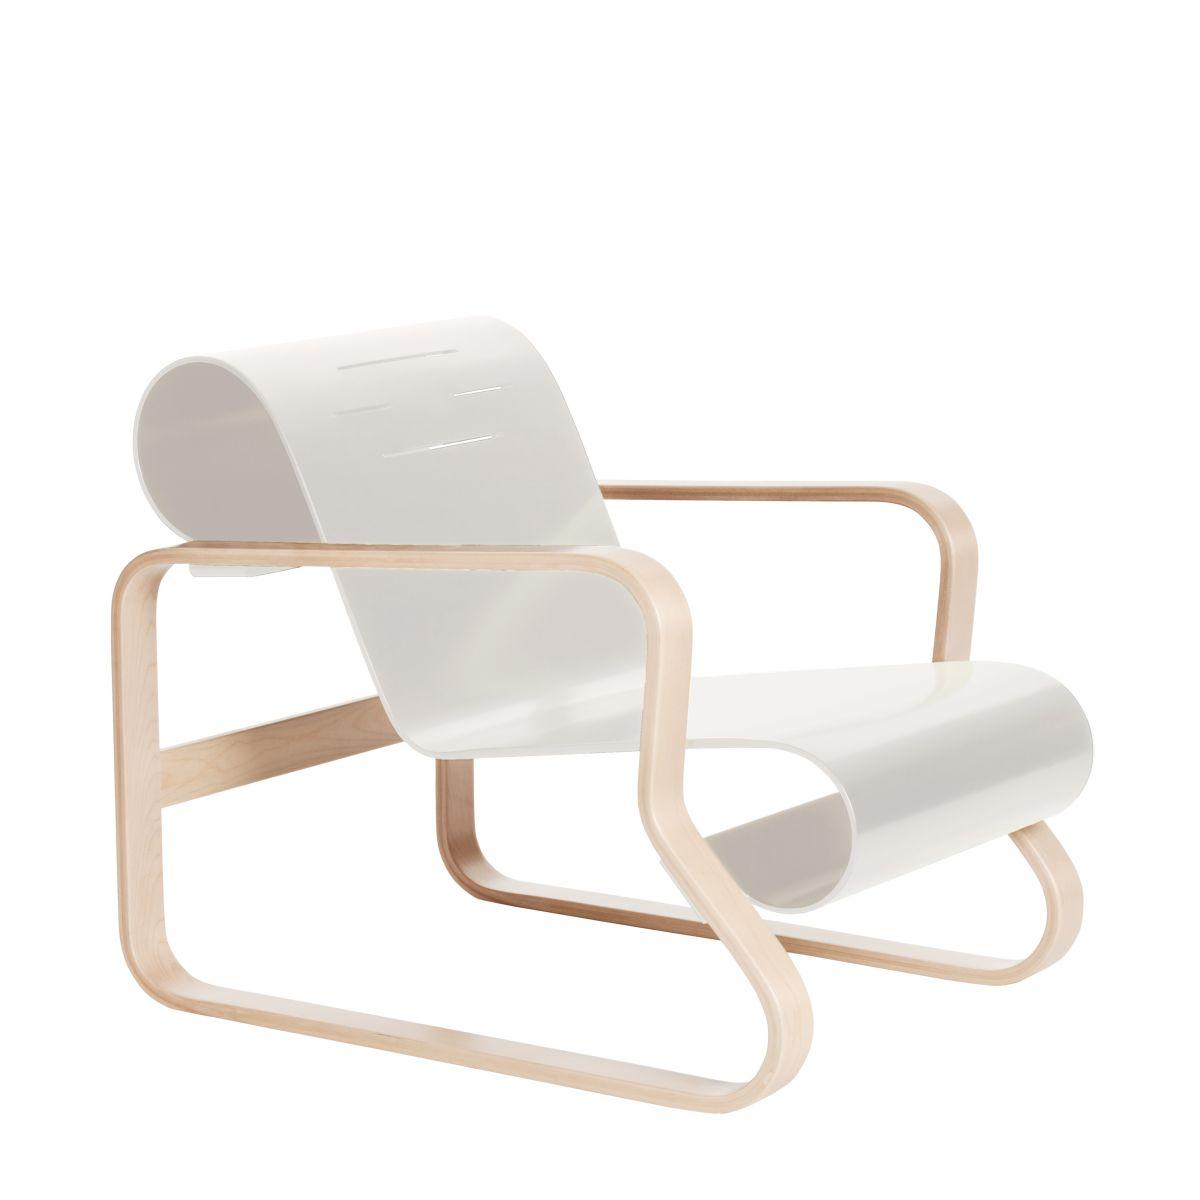 Armchair-41-_Paimio_-White-Lacquer-2053410